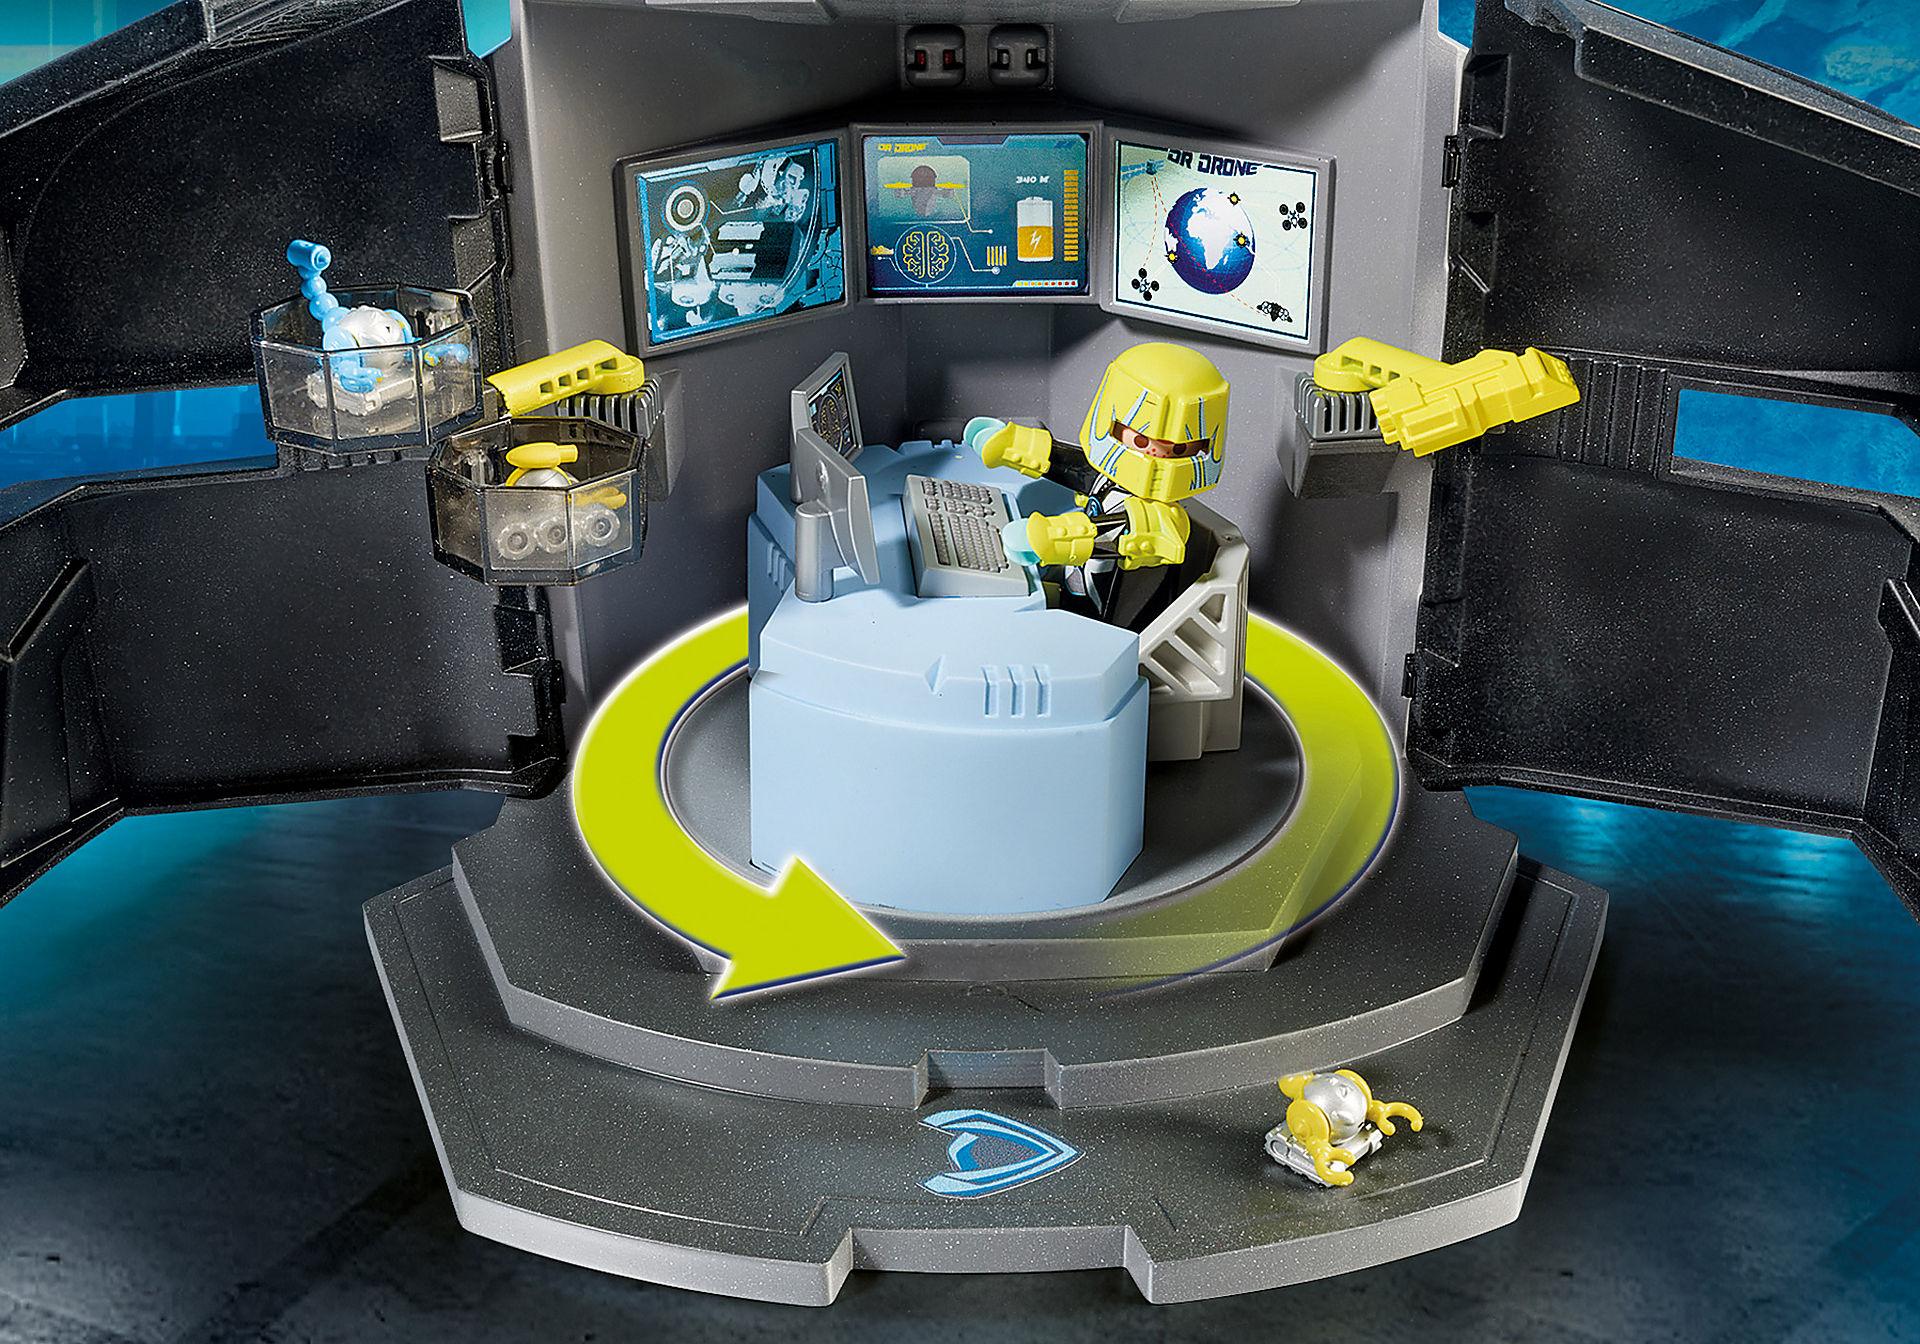 http://media.playmobil.com/i/playmobil/9250_product_extra1/Dr. Drone's Command Center